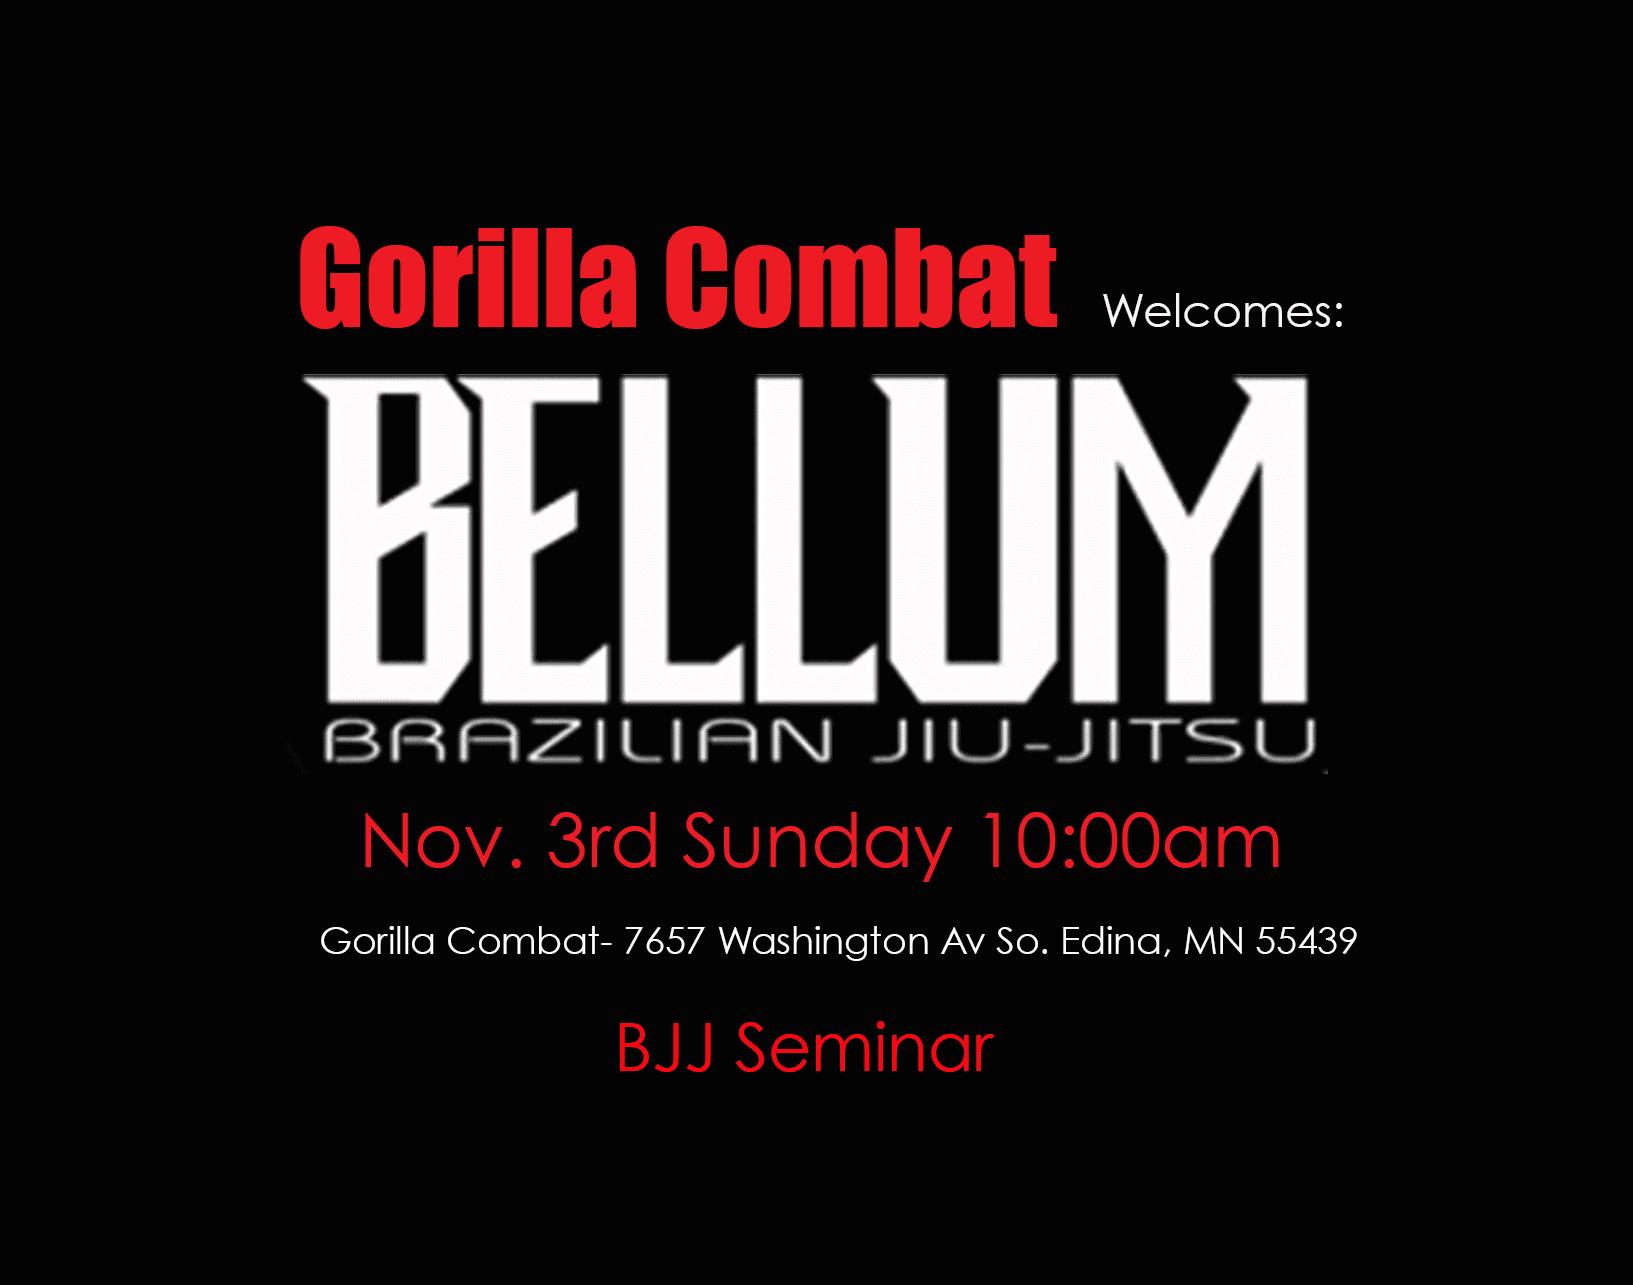 'Bellum BJJ' Seminar Nov.3